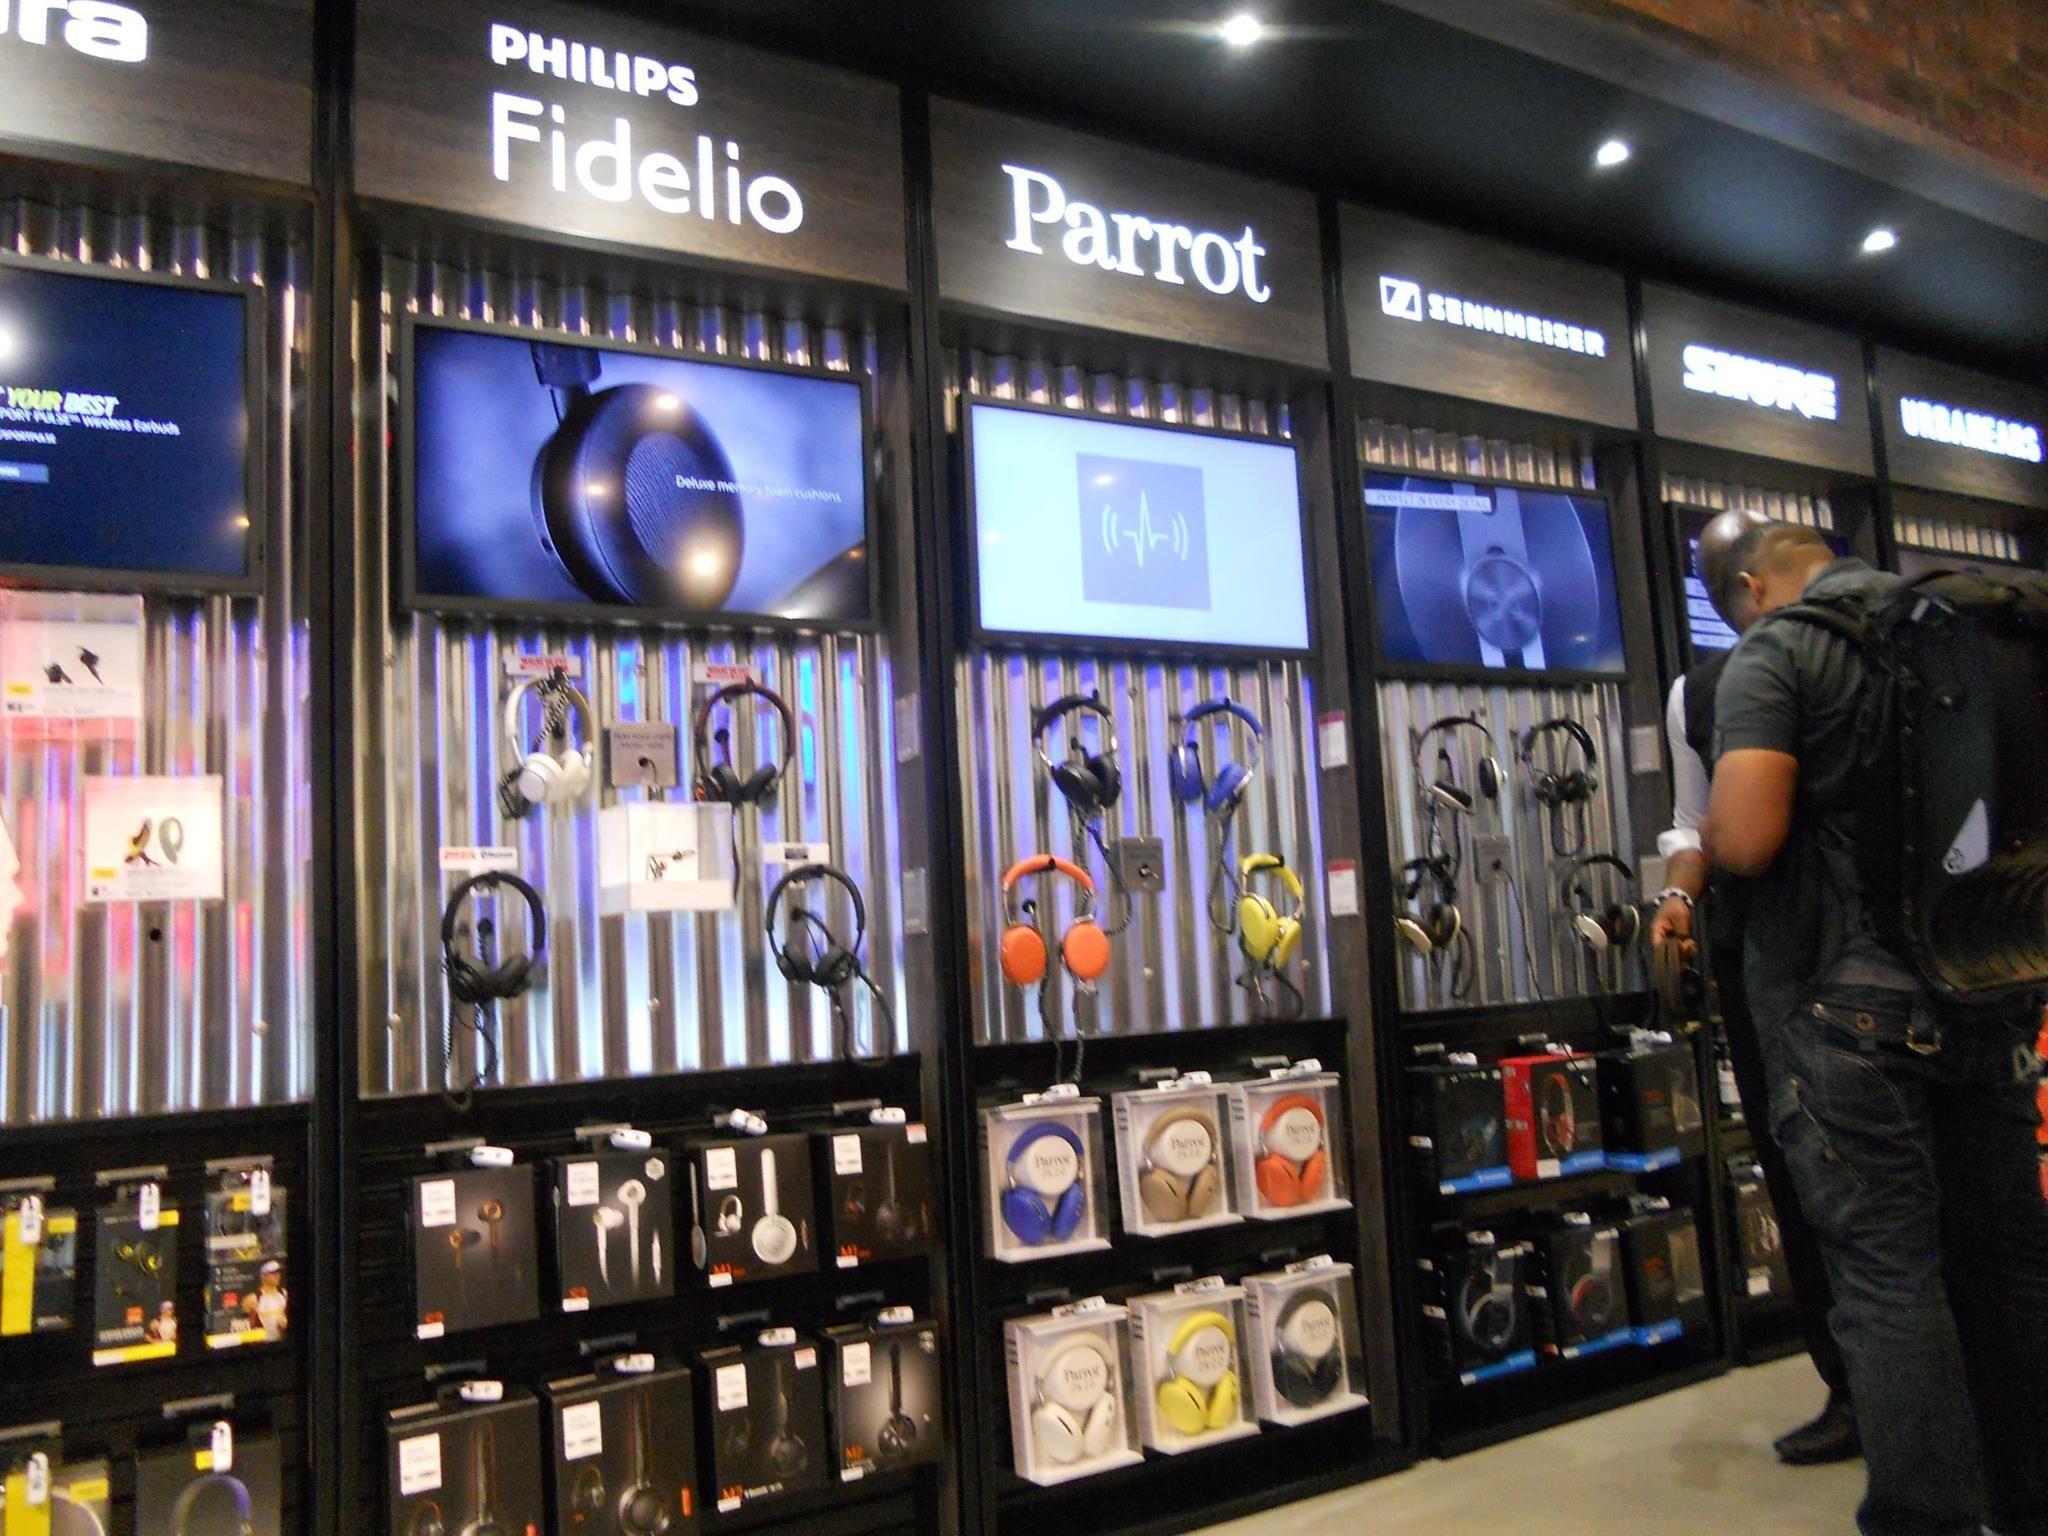 Selfridges Sonic Showcase Wall Of Sound Store Design Interior Electronics Store Display Mobile Shop Design